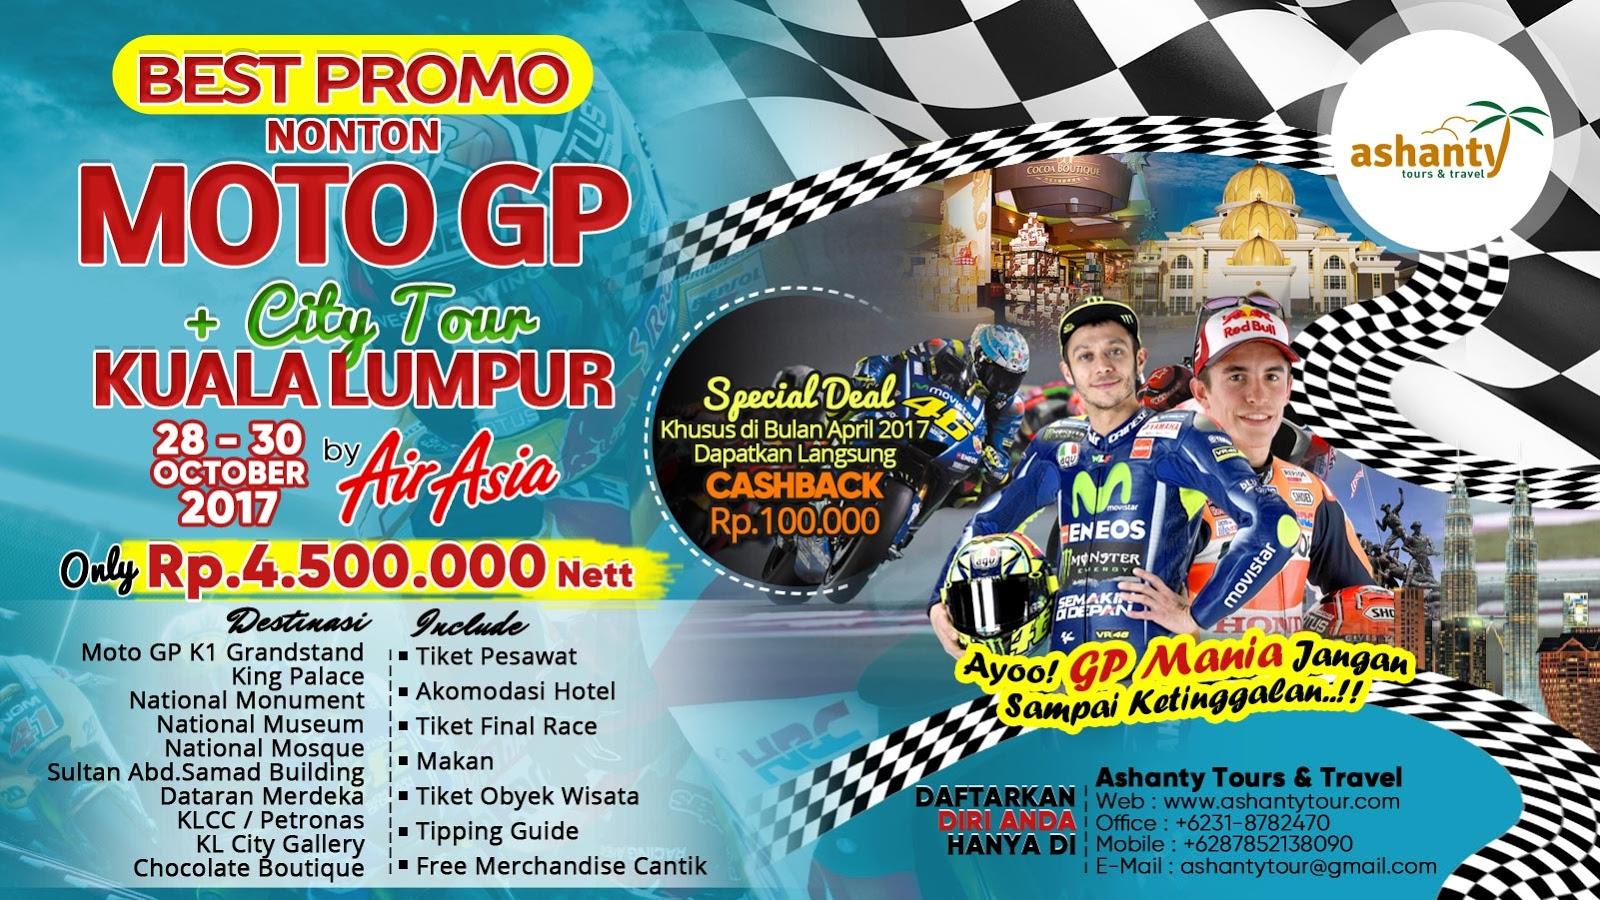 paket tour motogp sepang 2018 dari surabaya, harga paket tour motogp sepang 2018, paket nonton motogp sepang 2018